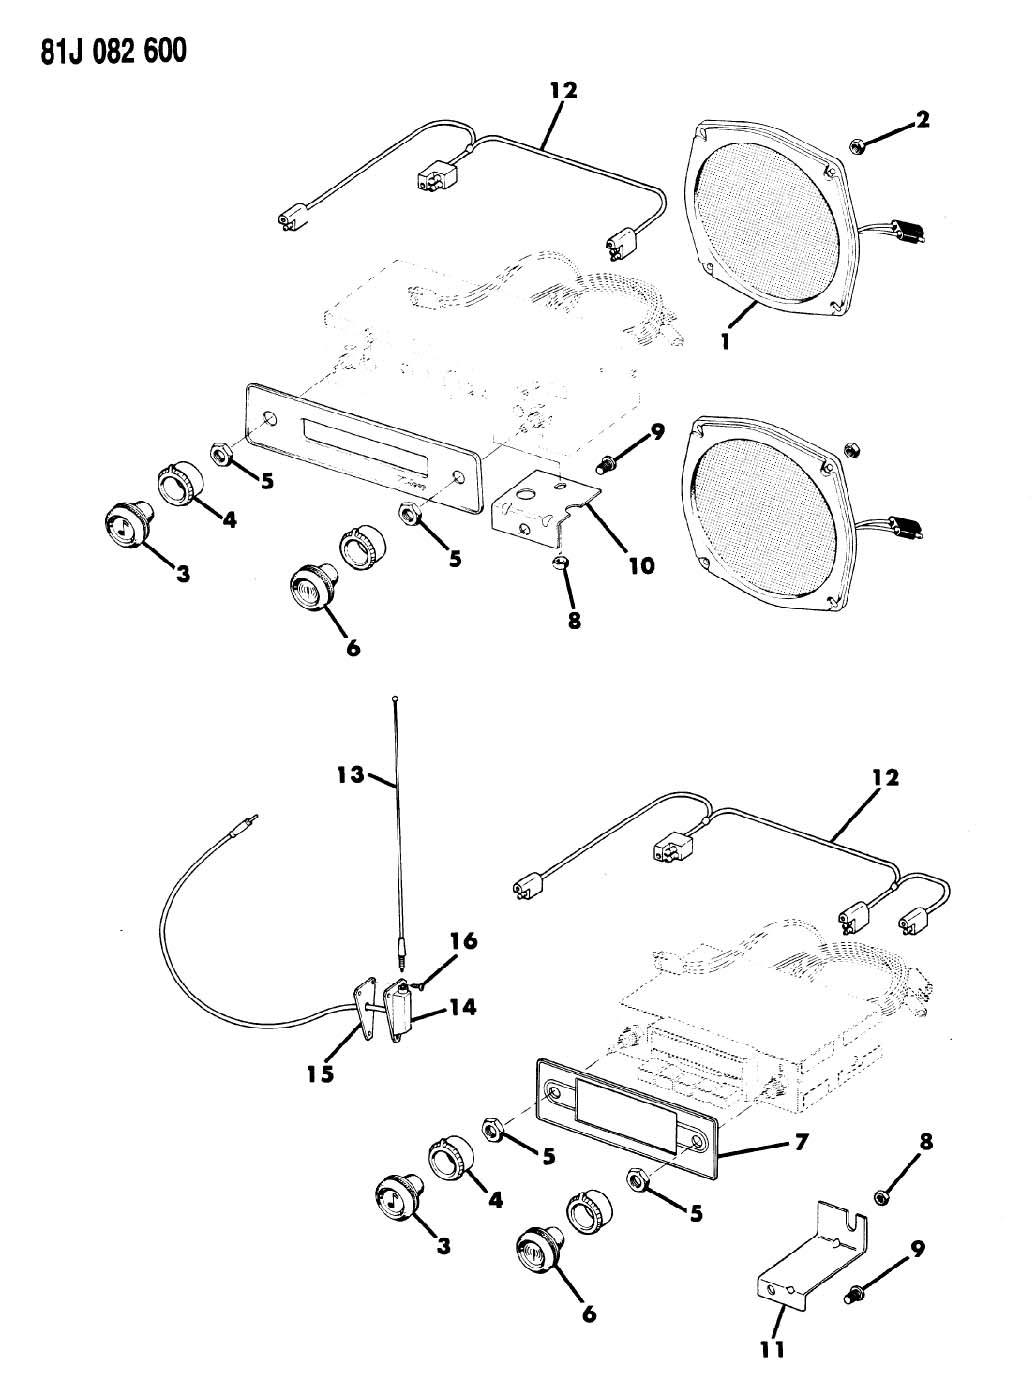 Jeep Tj Turn Signal Wiring Diagram : 2002 Grand Cherokee